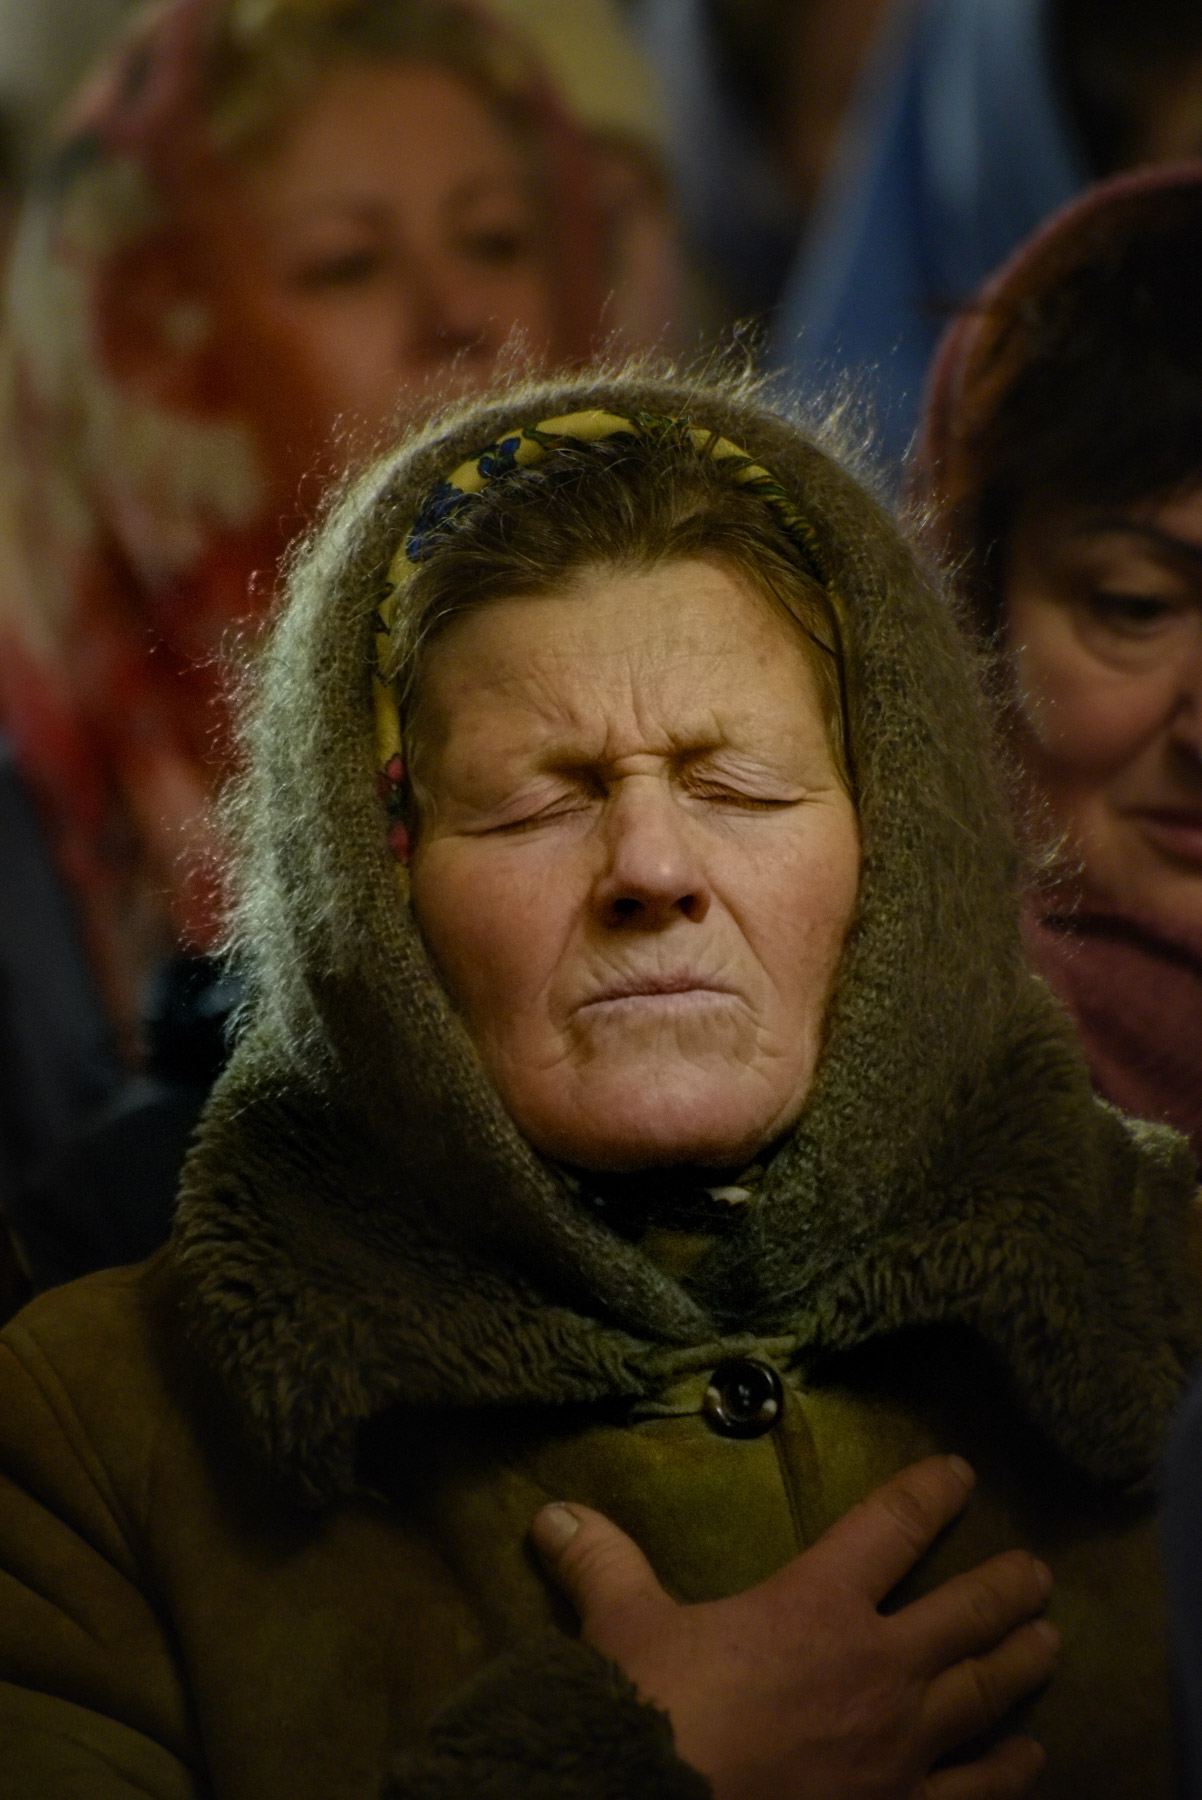 photos of orthodox christmas 0230 2